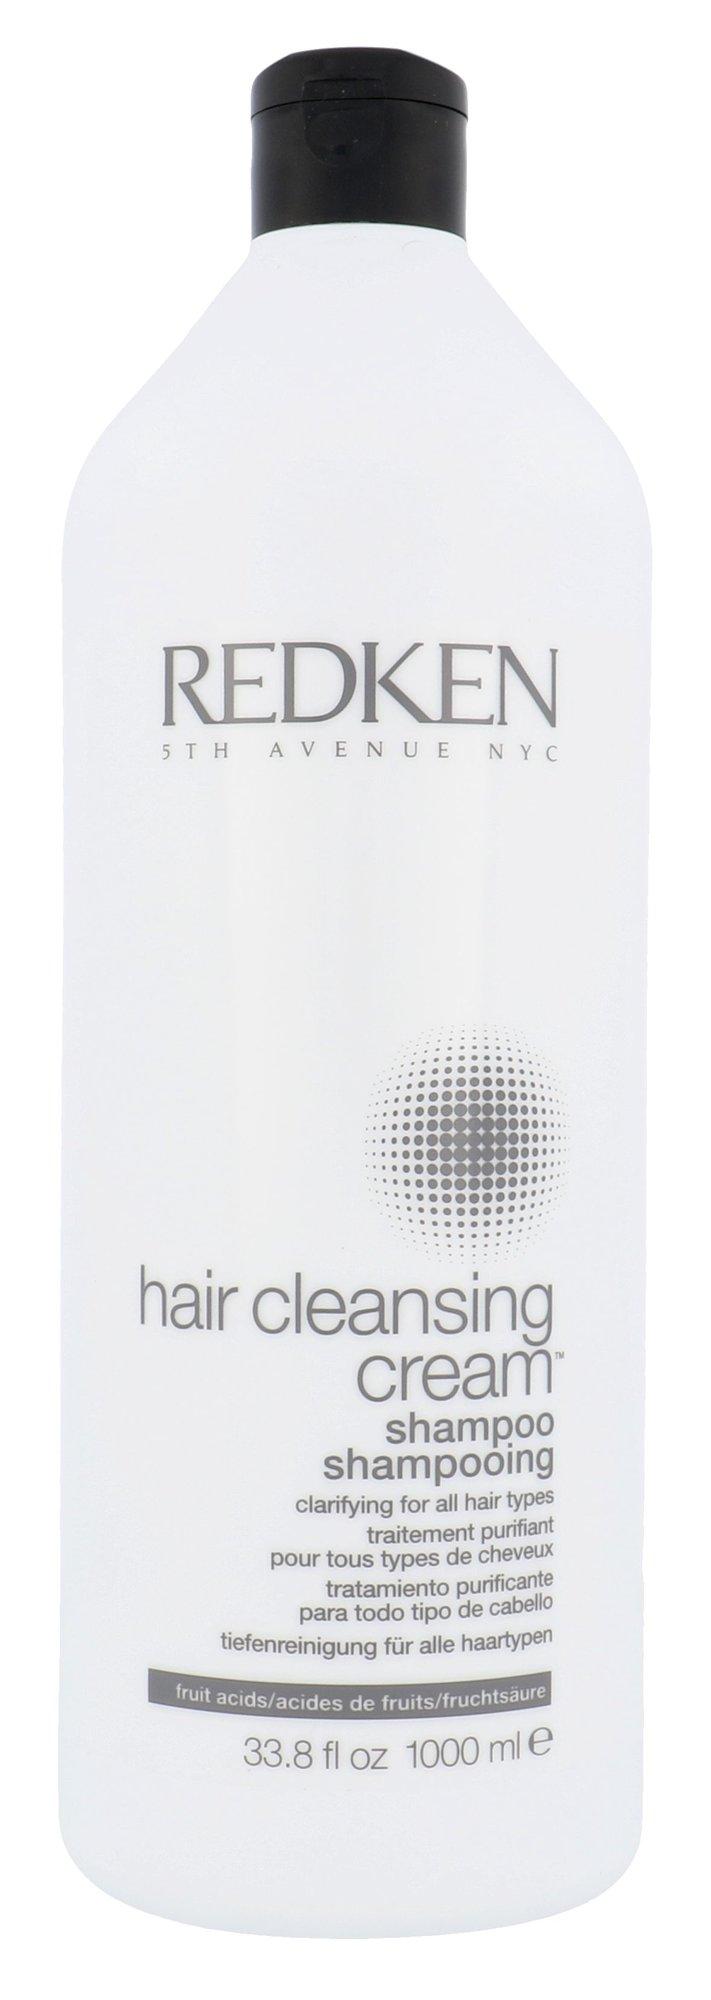 Redken Hair Cleansing Cream Cosmetic 1000ml